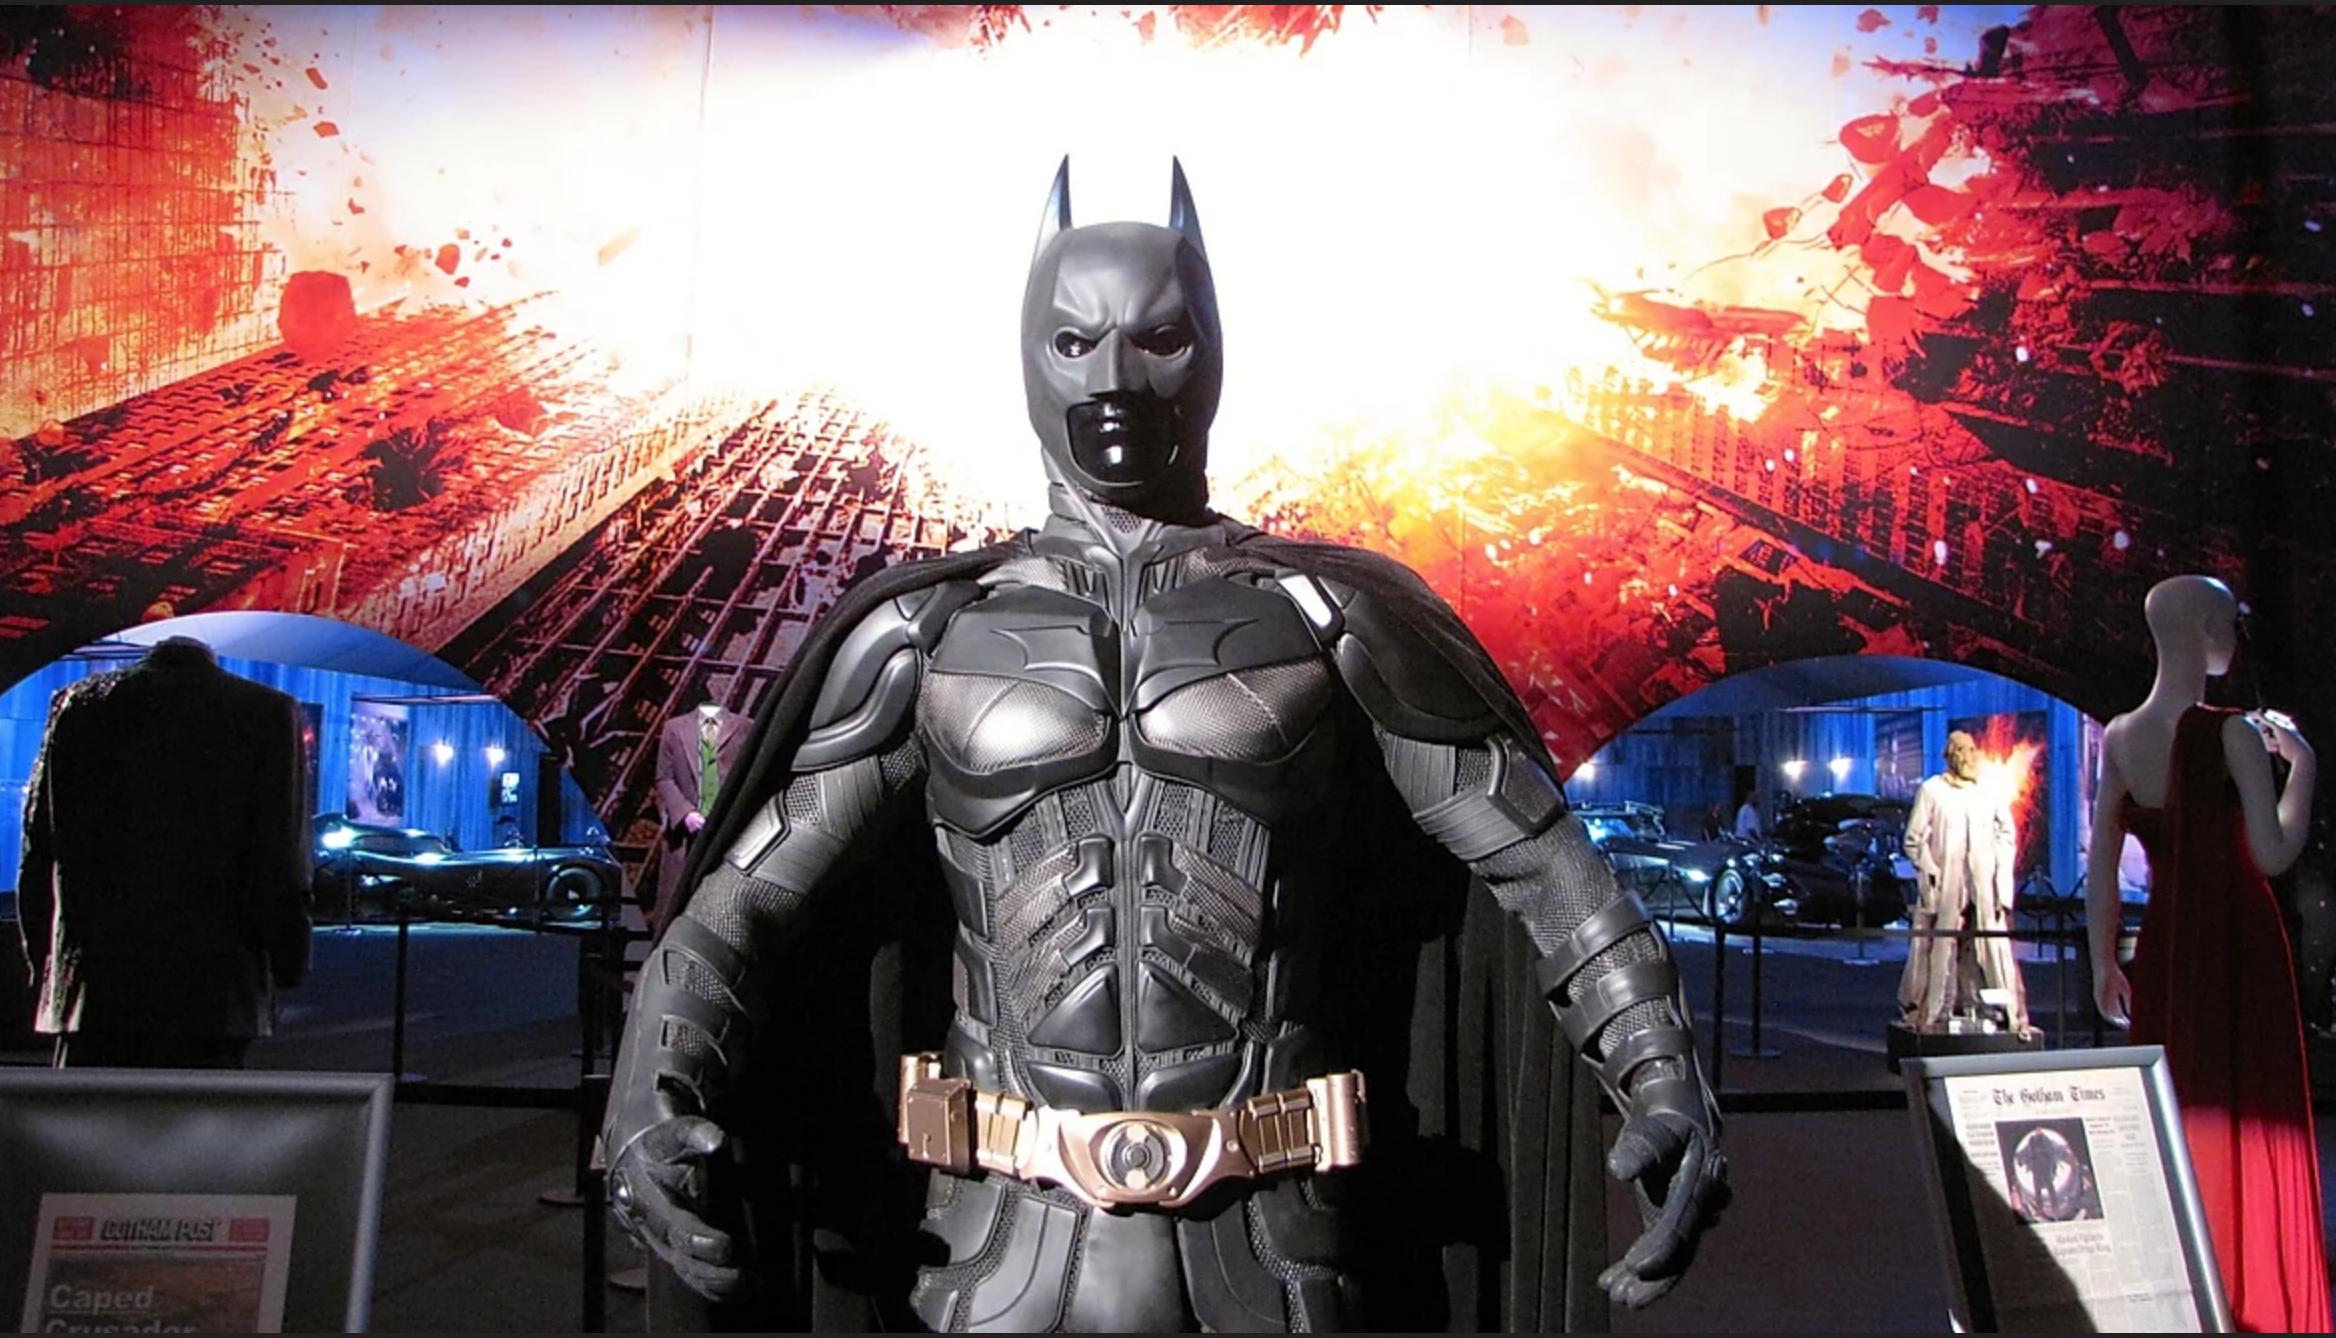 Dark Knight Rises Exhibition